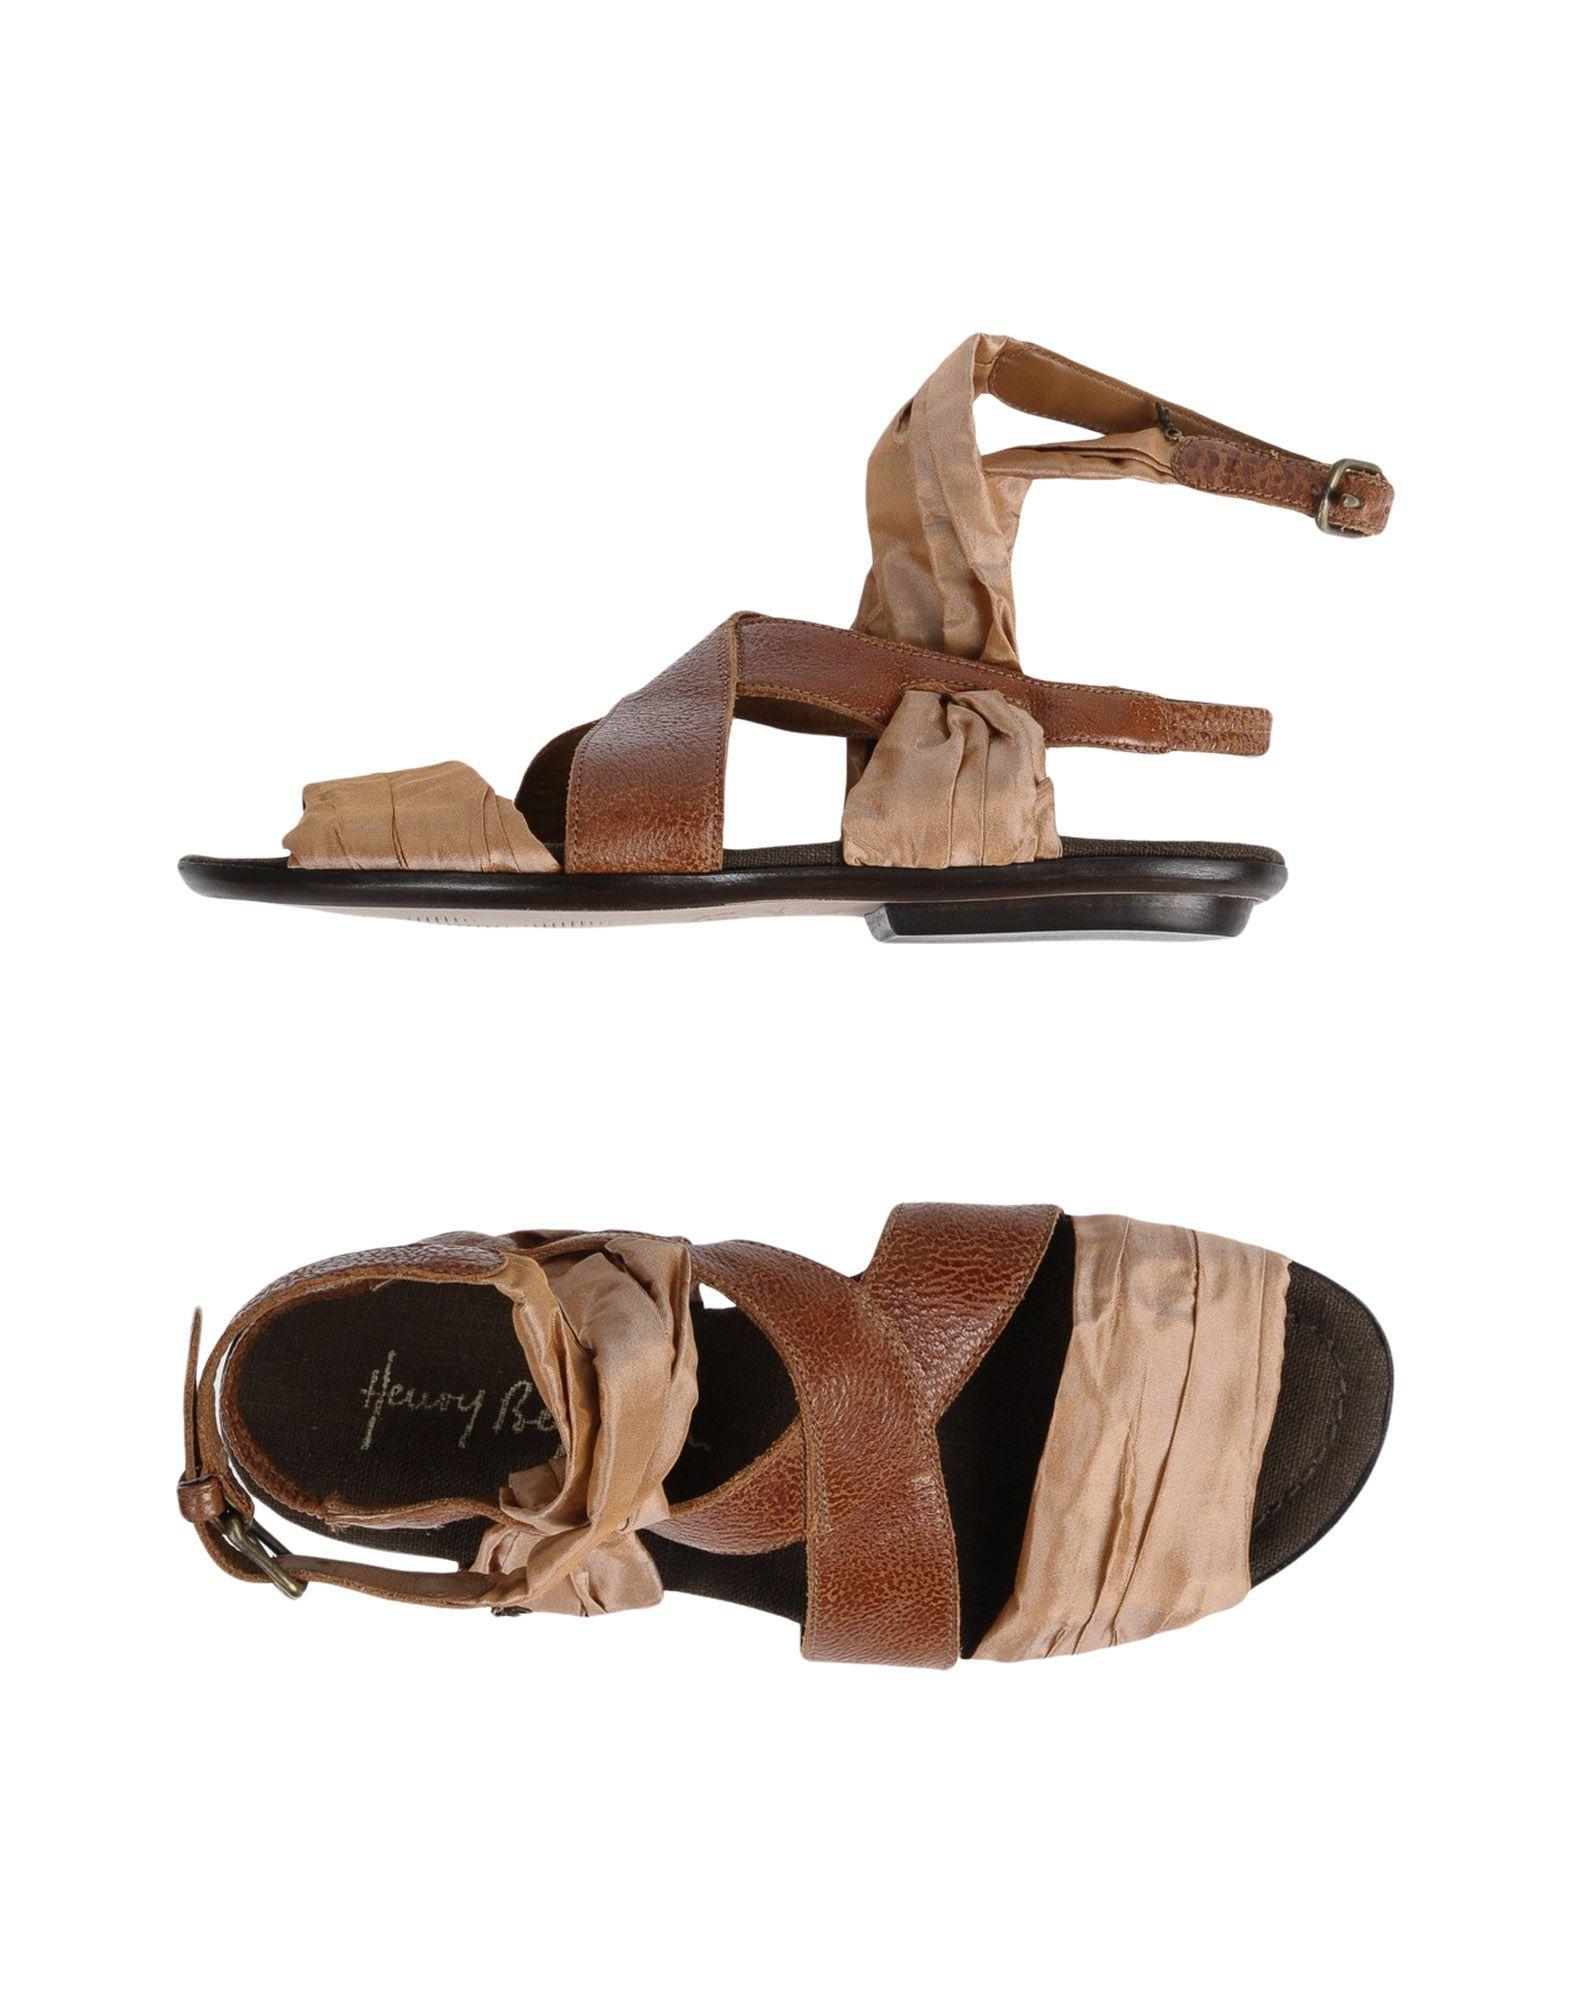 Henry Beguelin Sandals Sandals - Women Henry Beguelin Sandals Sandals online on  United Kingdom - 11504064PT feede5